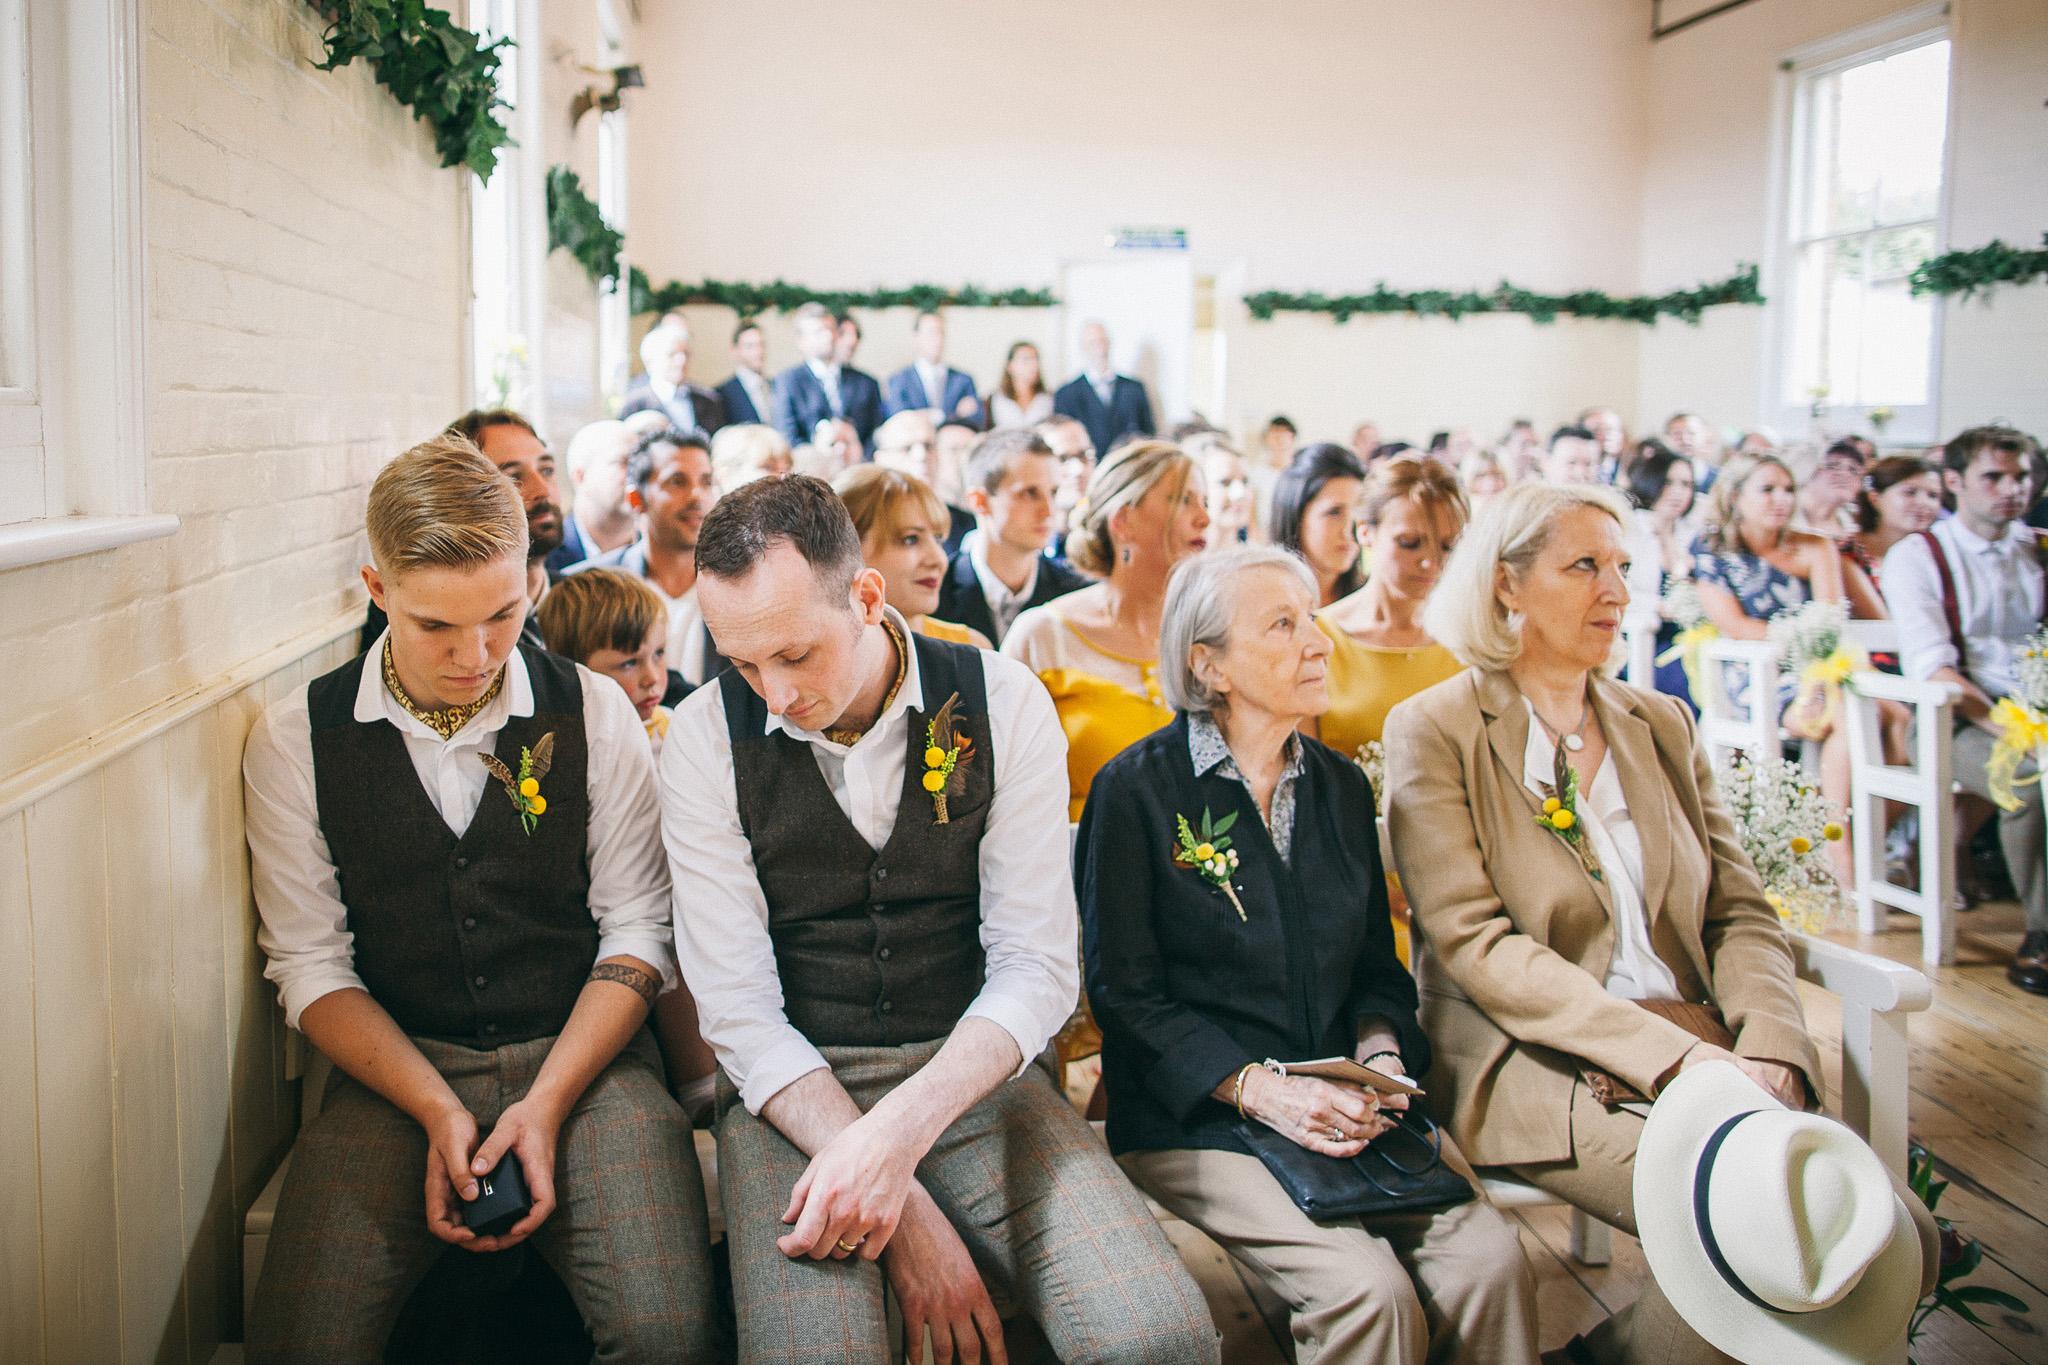 chantry_sussex_barn_wedding_314.jpg